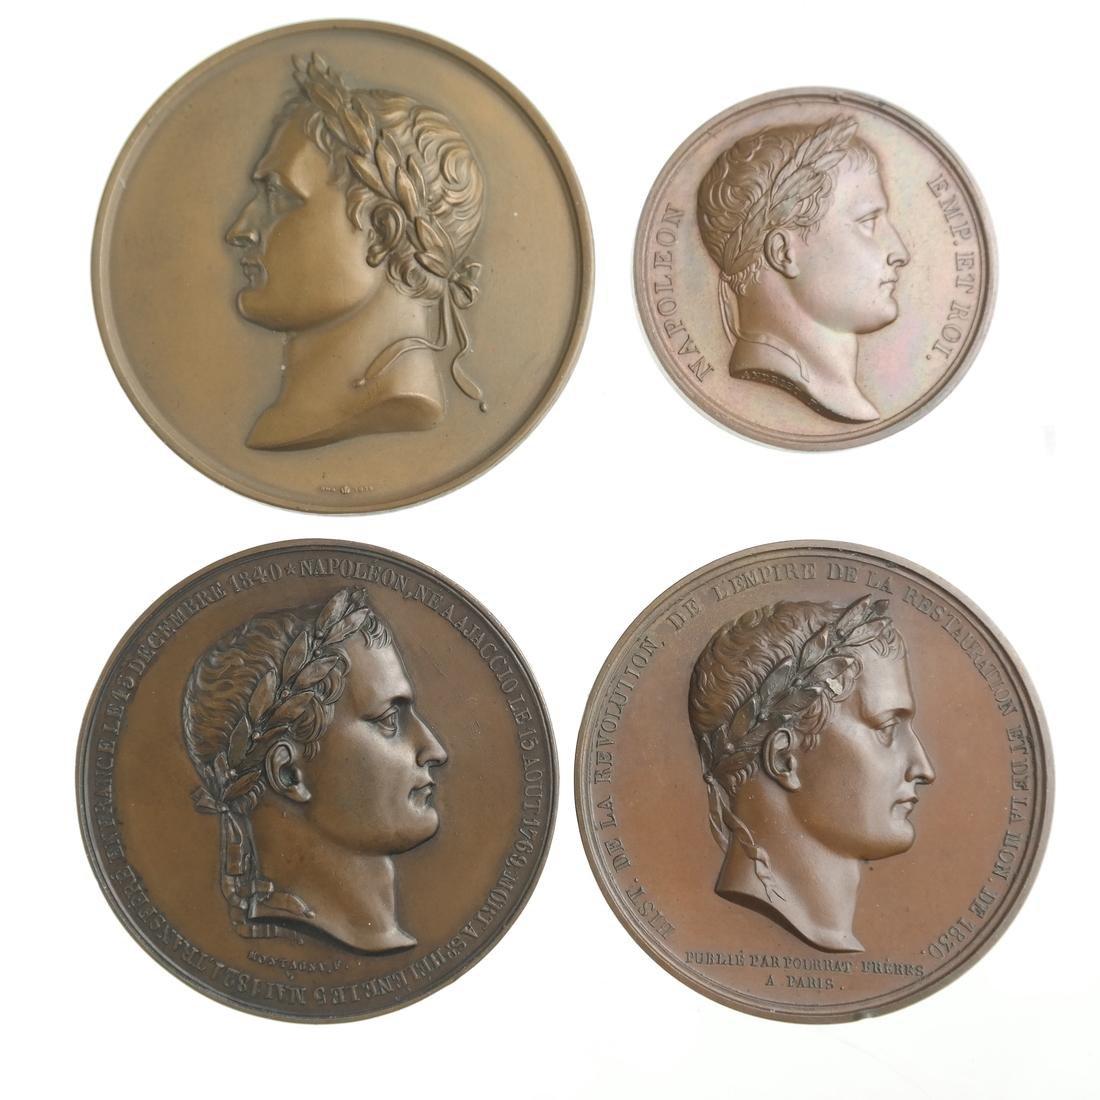 FRANCE. QUARTET OF NAPOLEONIC BRONZE MEDALS, 1804-1914.